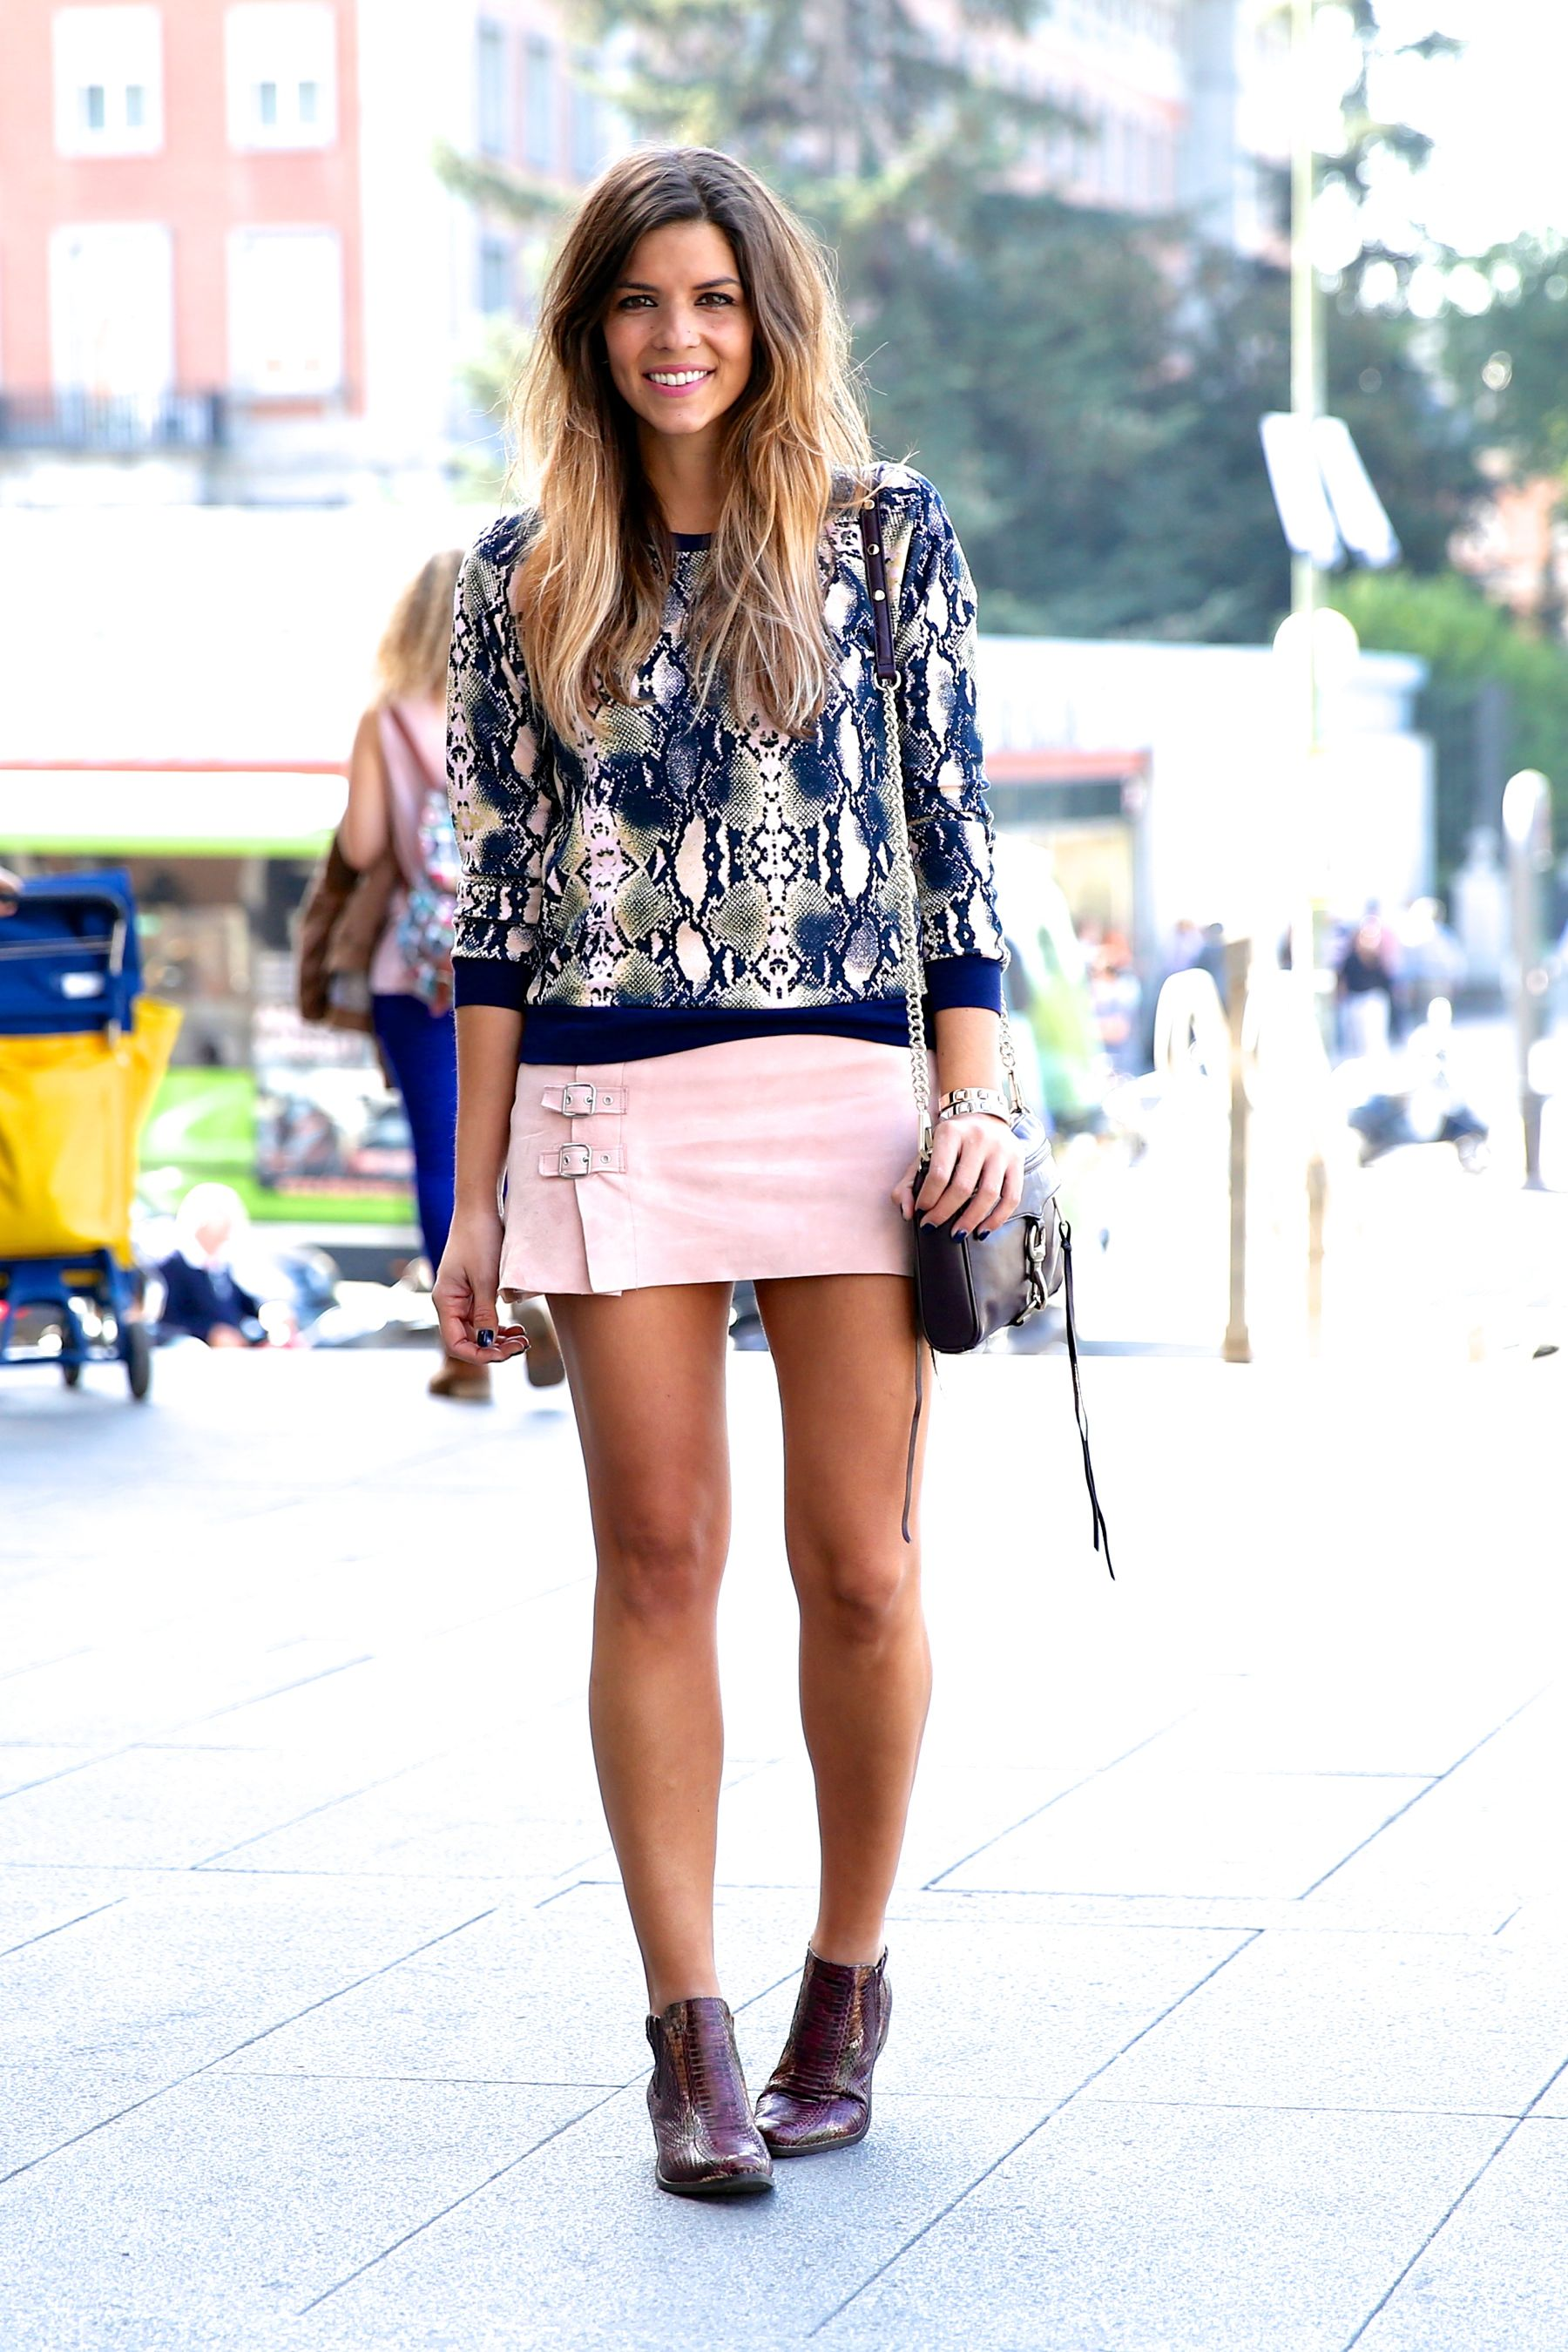 trendy_taste-look-outfit-street_style-ootd-blog-blogger-fashion_spain-moda_españa-girissima.com-sweatshirt-sudadera-estampado-crocodile-cocodrilo-botines-booties-pink_skirt-falda_rosa-12